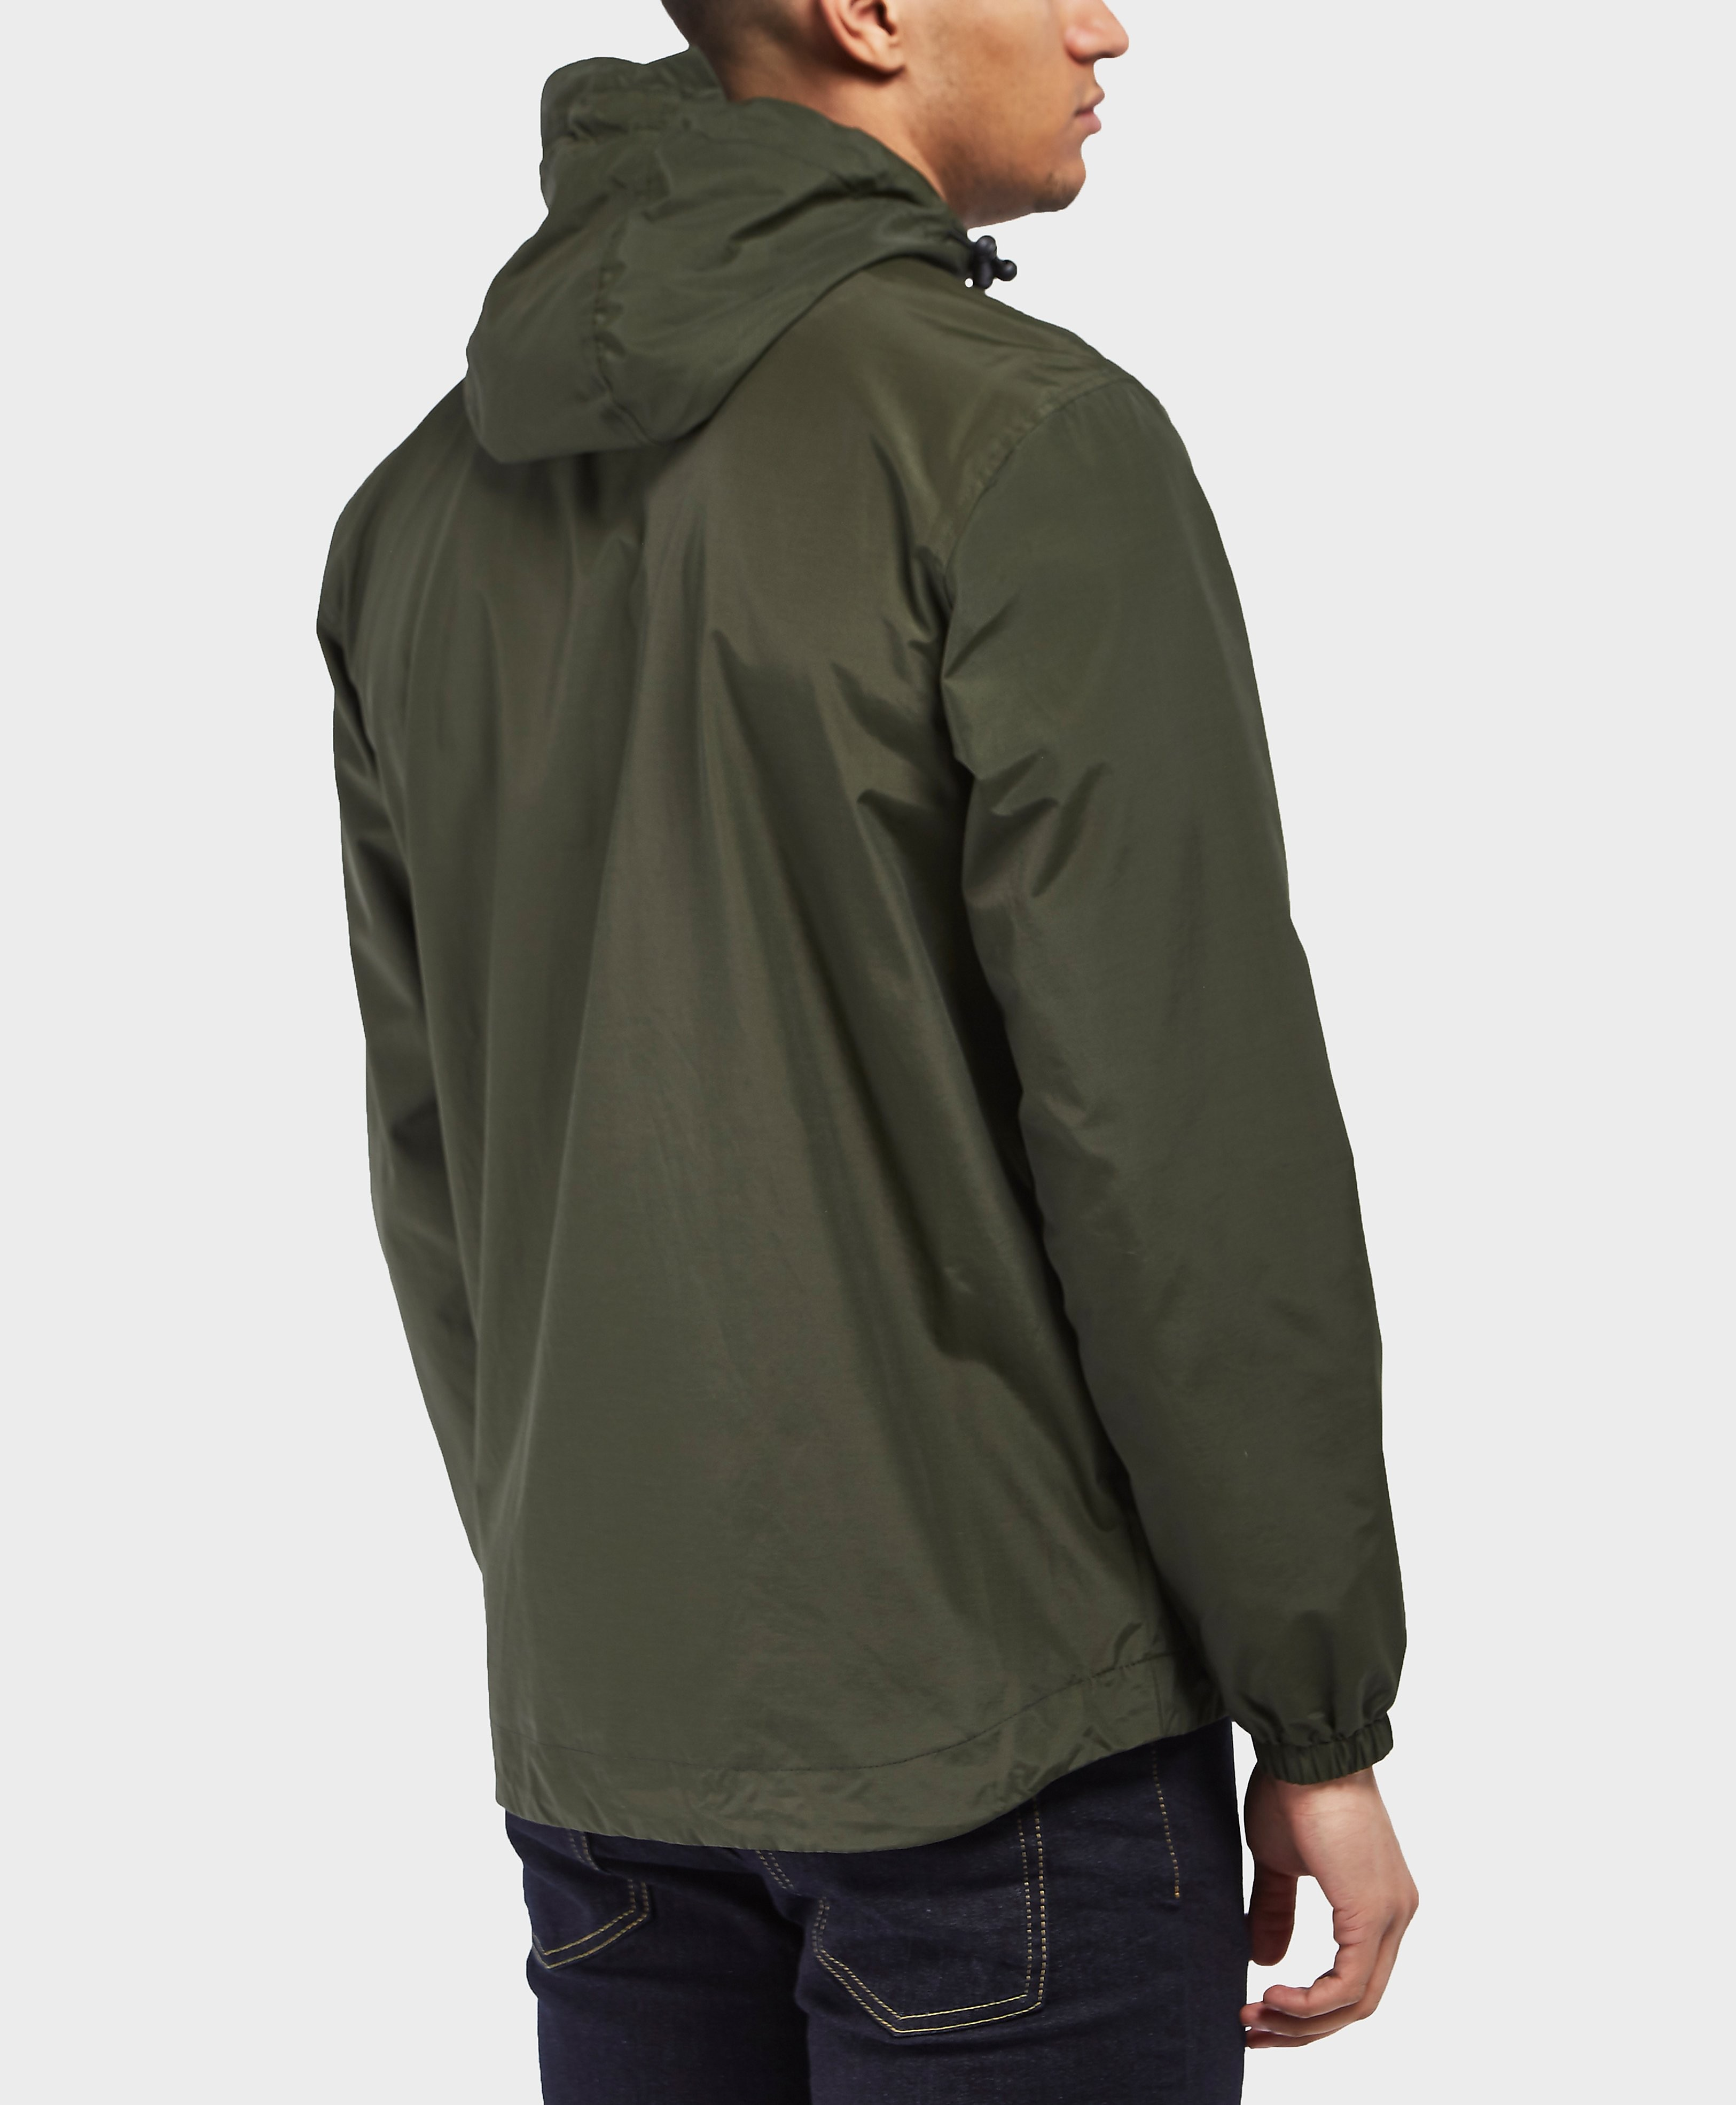 Lyle & Scott Full-Zip Hooded Jacket - Exclusive